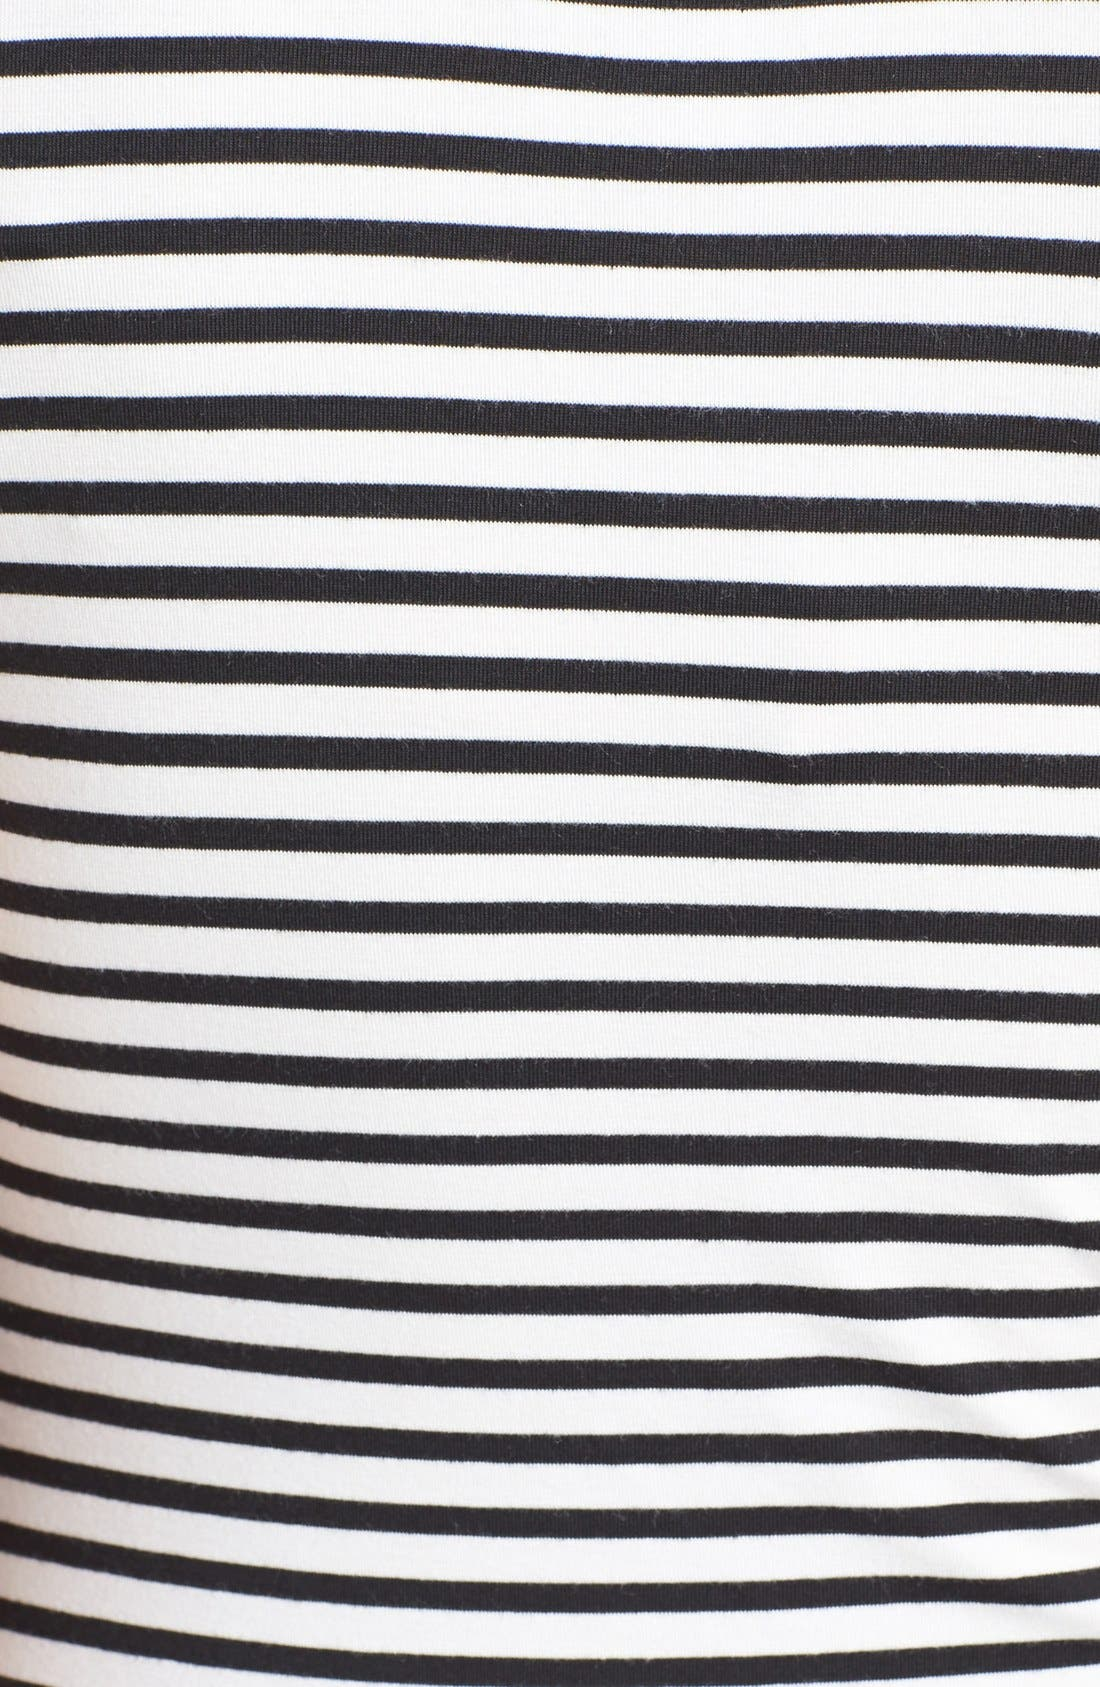 Sleeveless Maternity/Nursing Dress,                             Alternate thumbnail 4, color,                             001